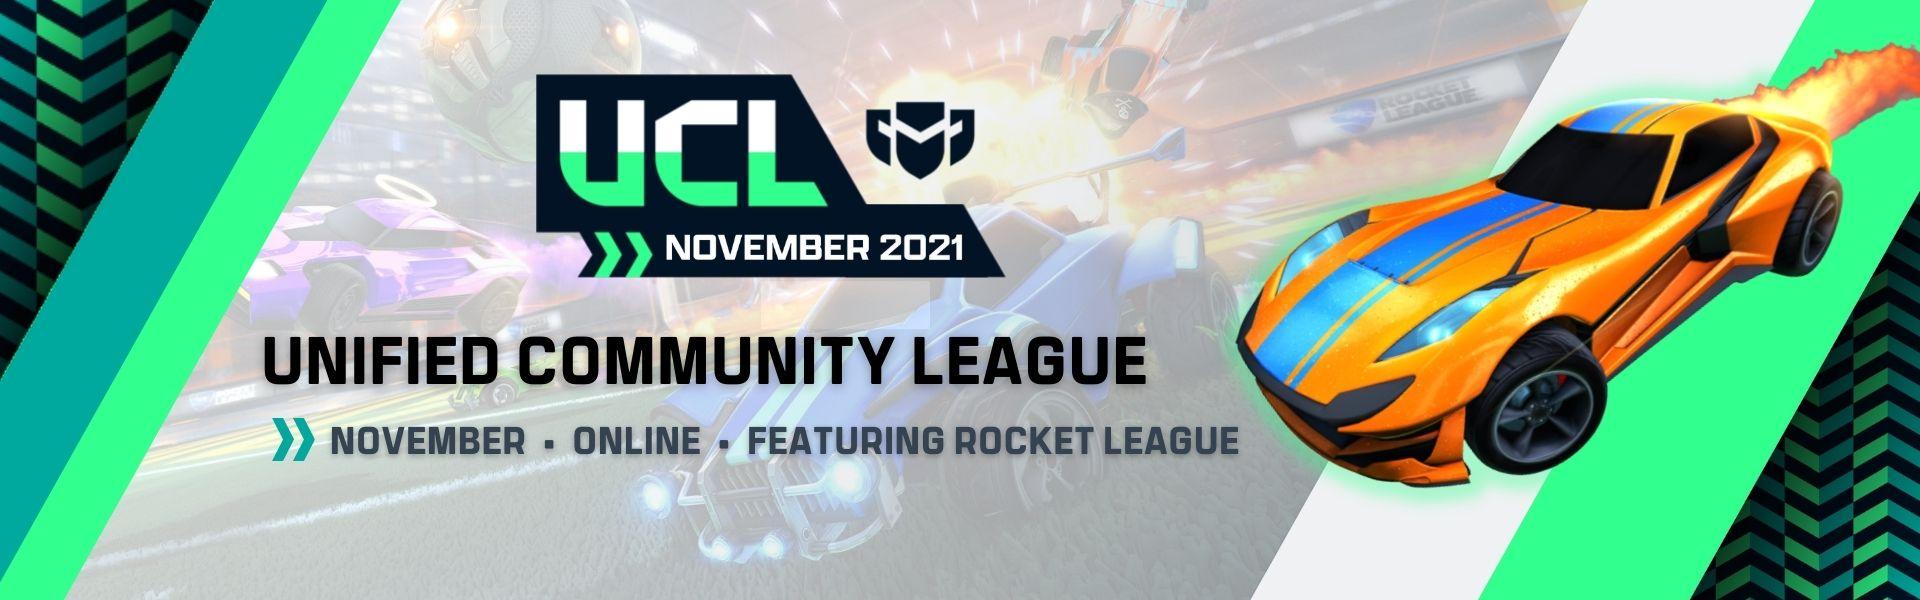 November UCL: Featuring Rocket League